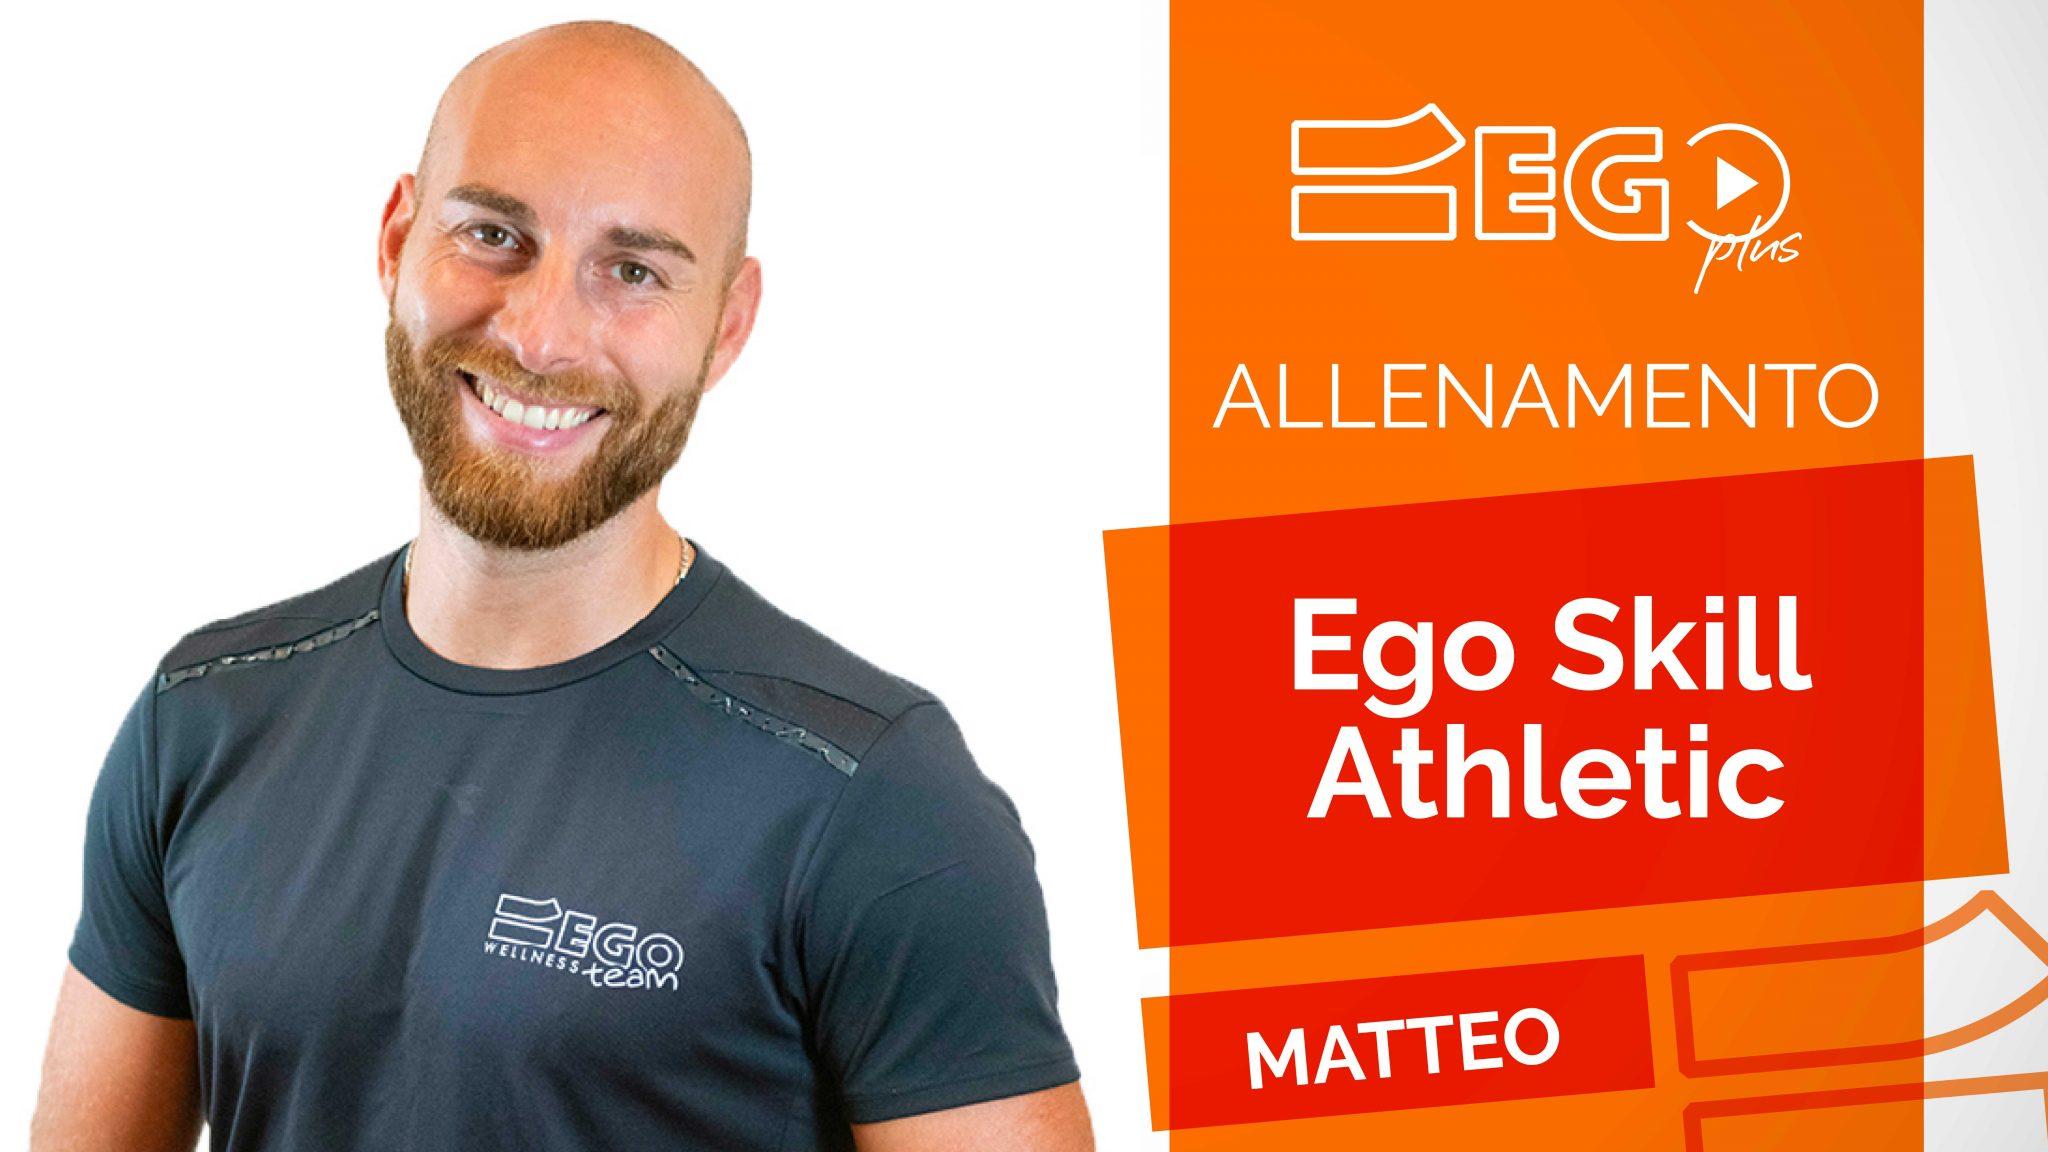 Matteo-Skill-Athletic-egoplus